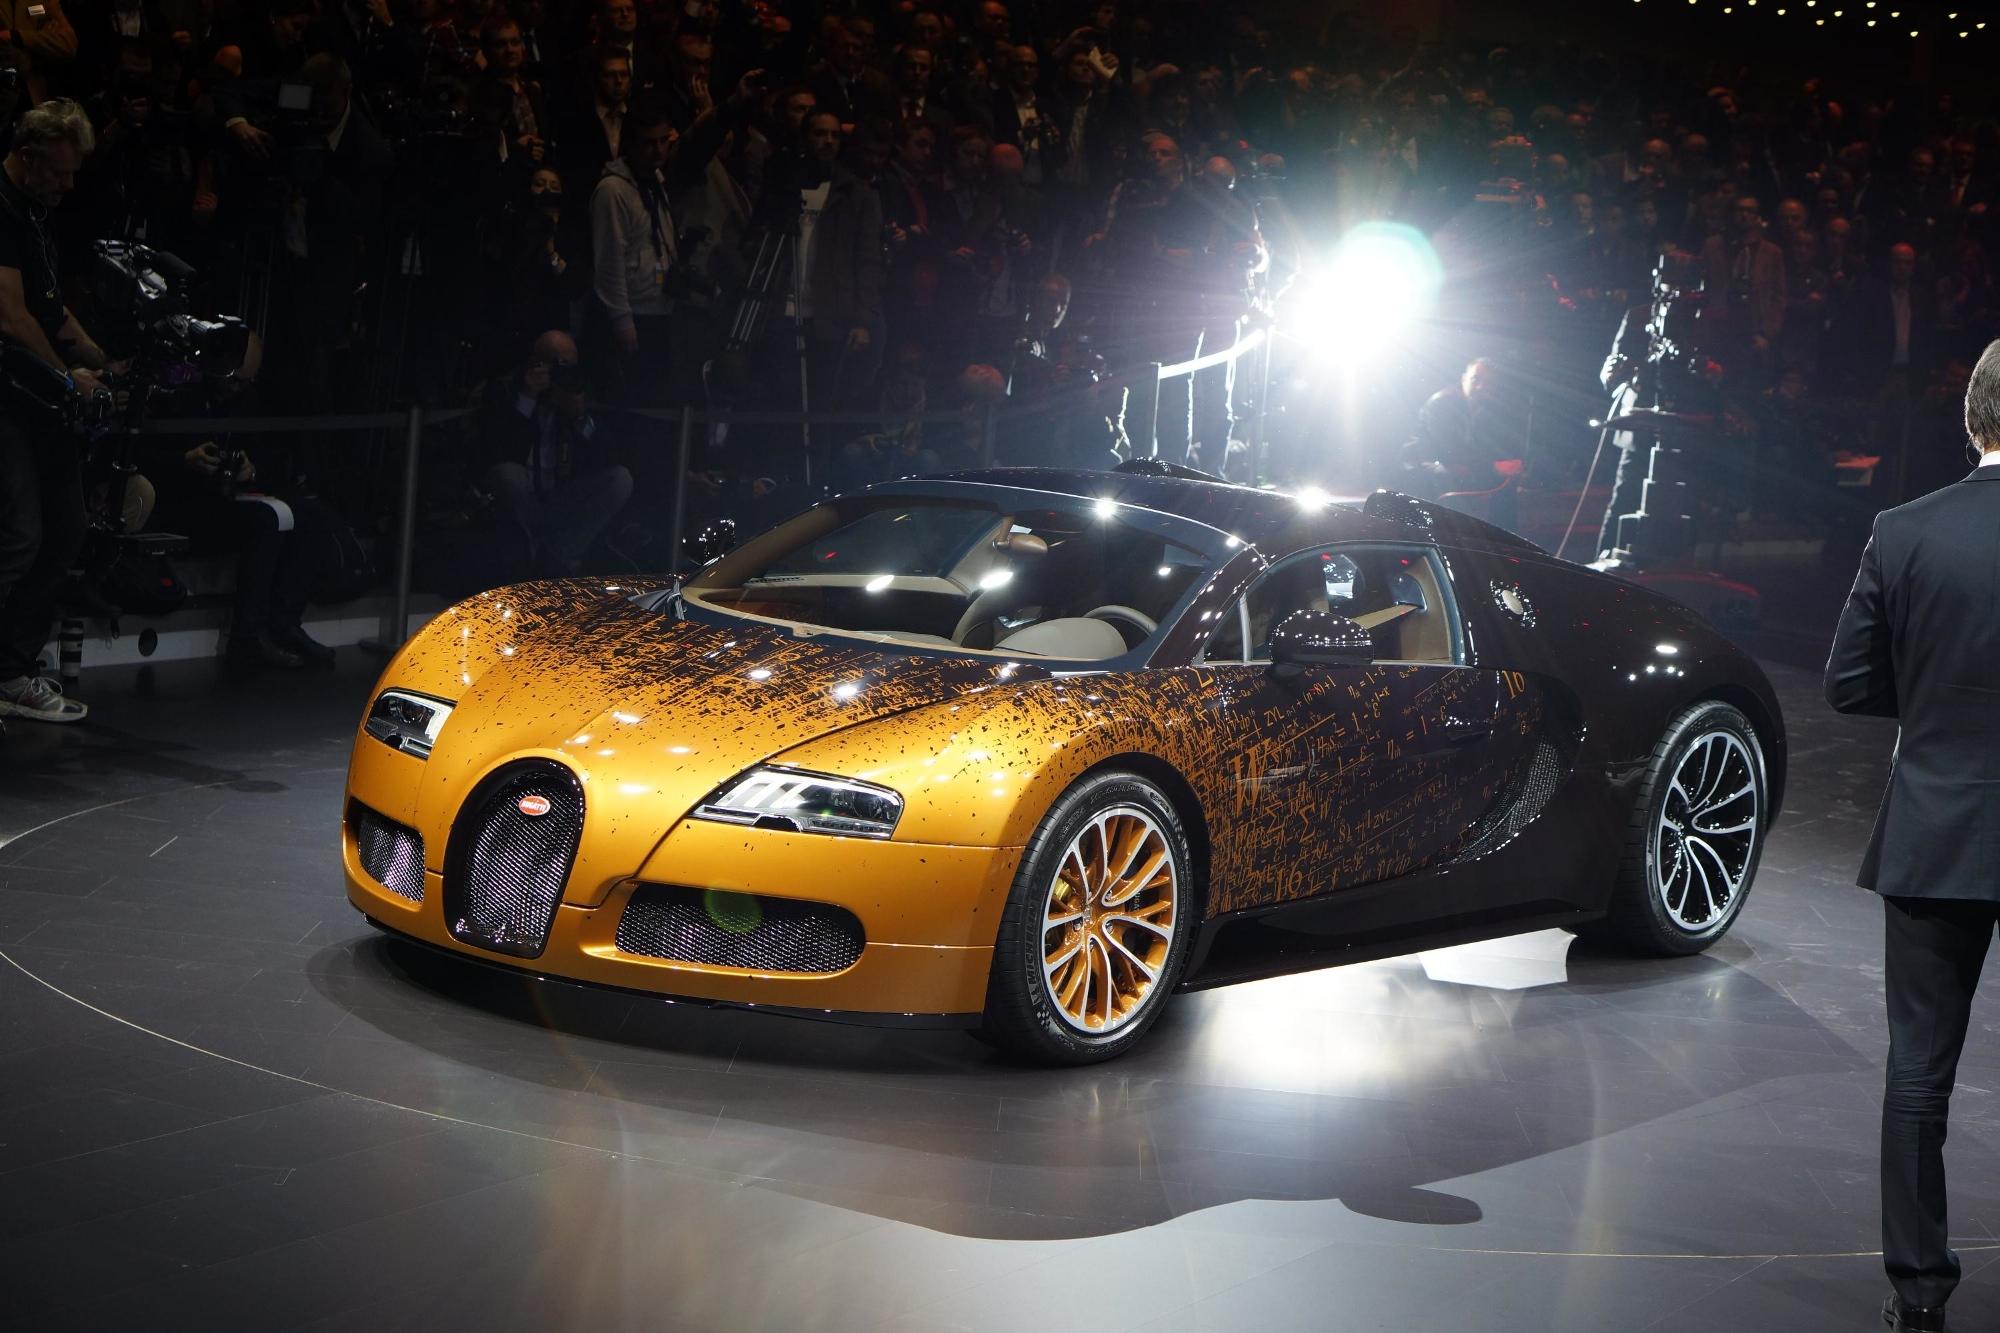 Bmw Of Little Rock >> Bugatti Veyron Grand Sport Venet Is a Rusty Piece of Geneva Art [Live Photos] - autoevolution